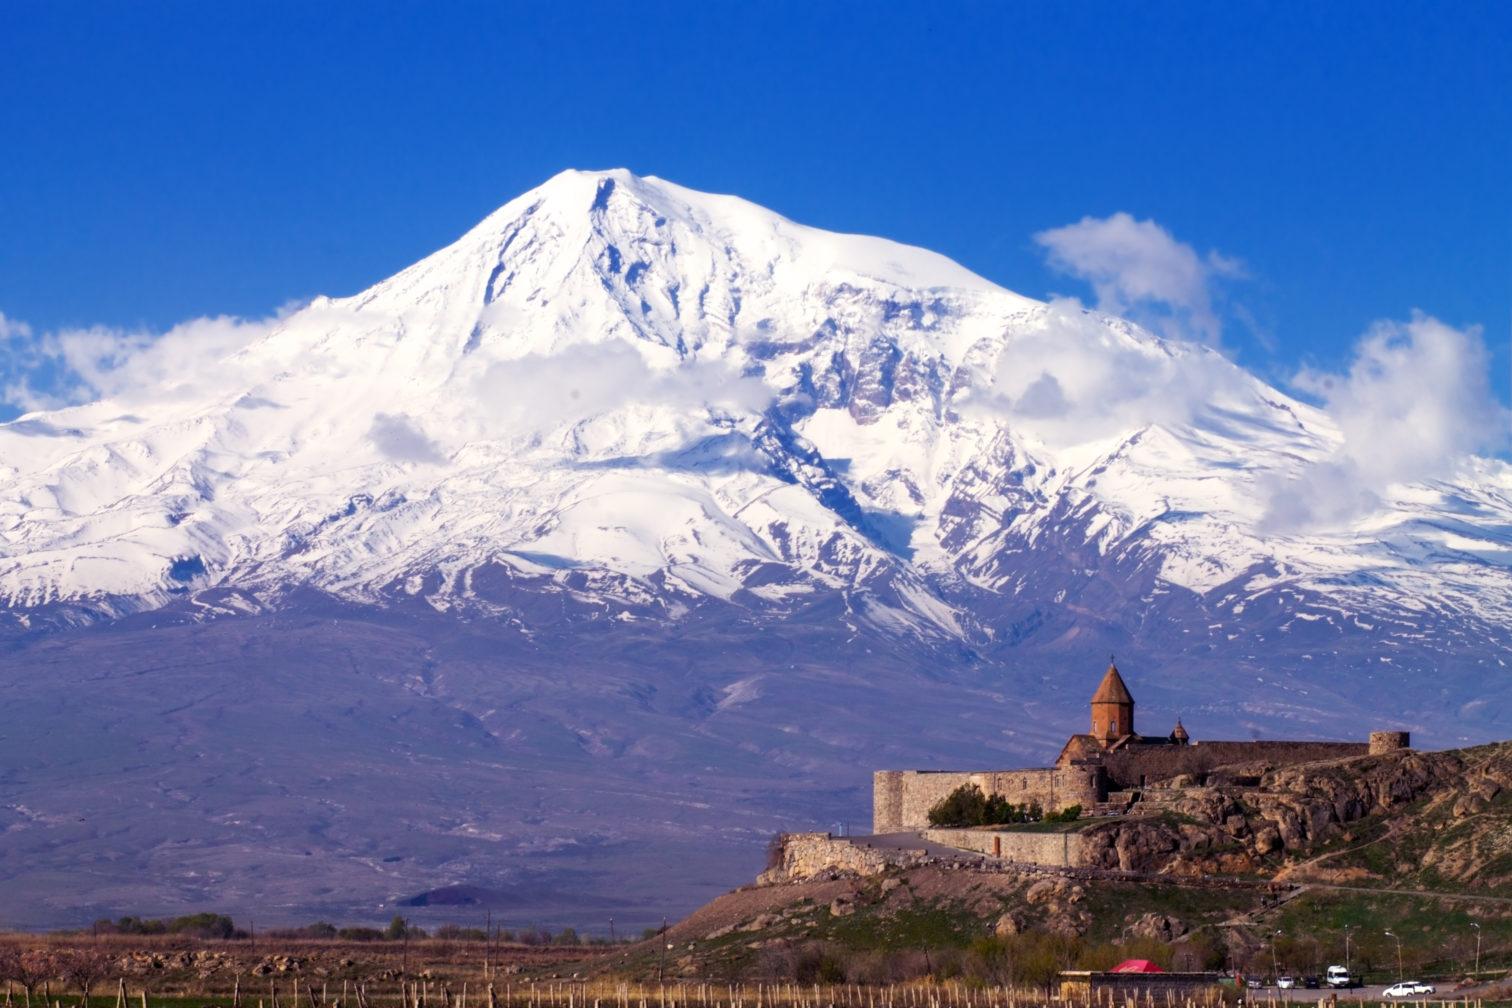 Mount Ararat rises behind Yerevan, Armenia.